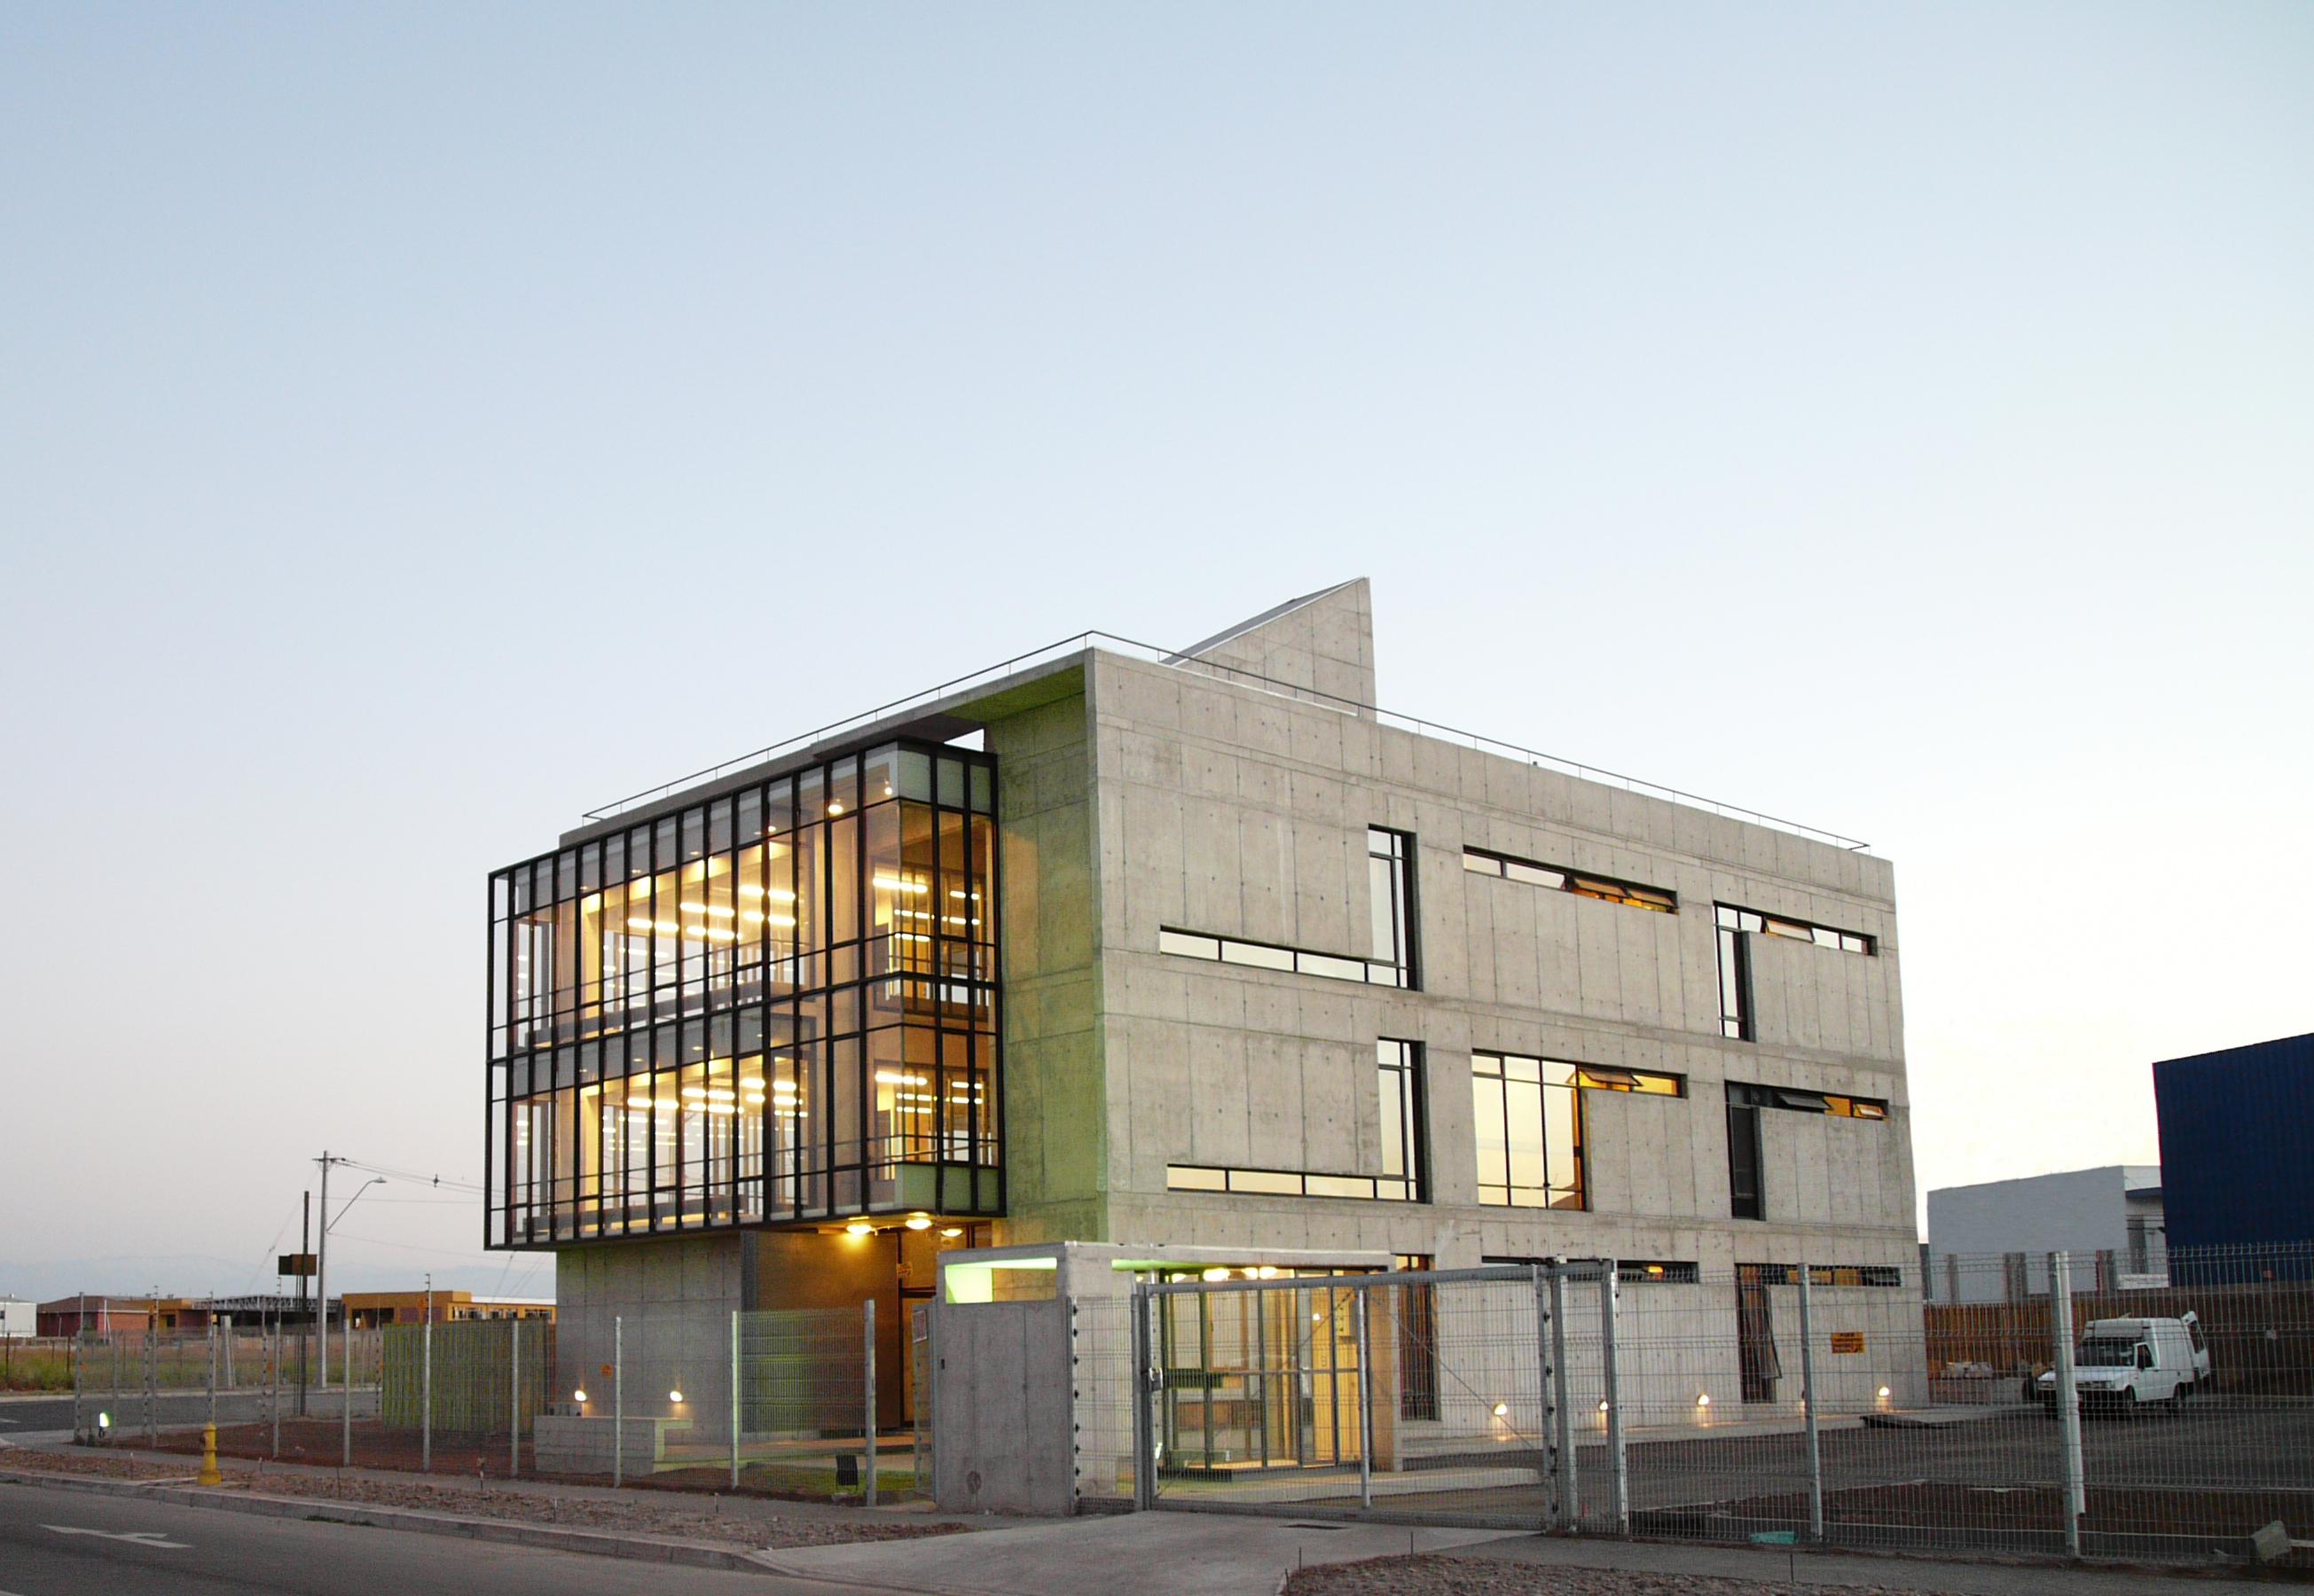 Edifício Corporativo SERINFO / +arquitectos, © + arquitectos